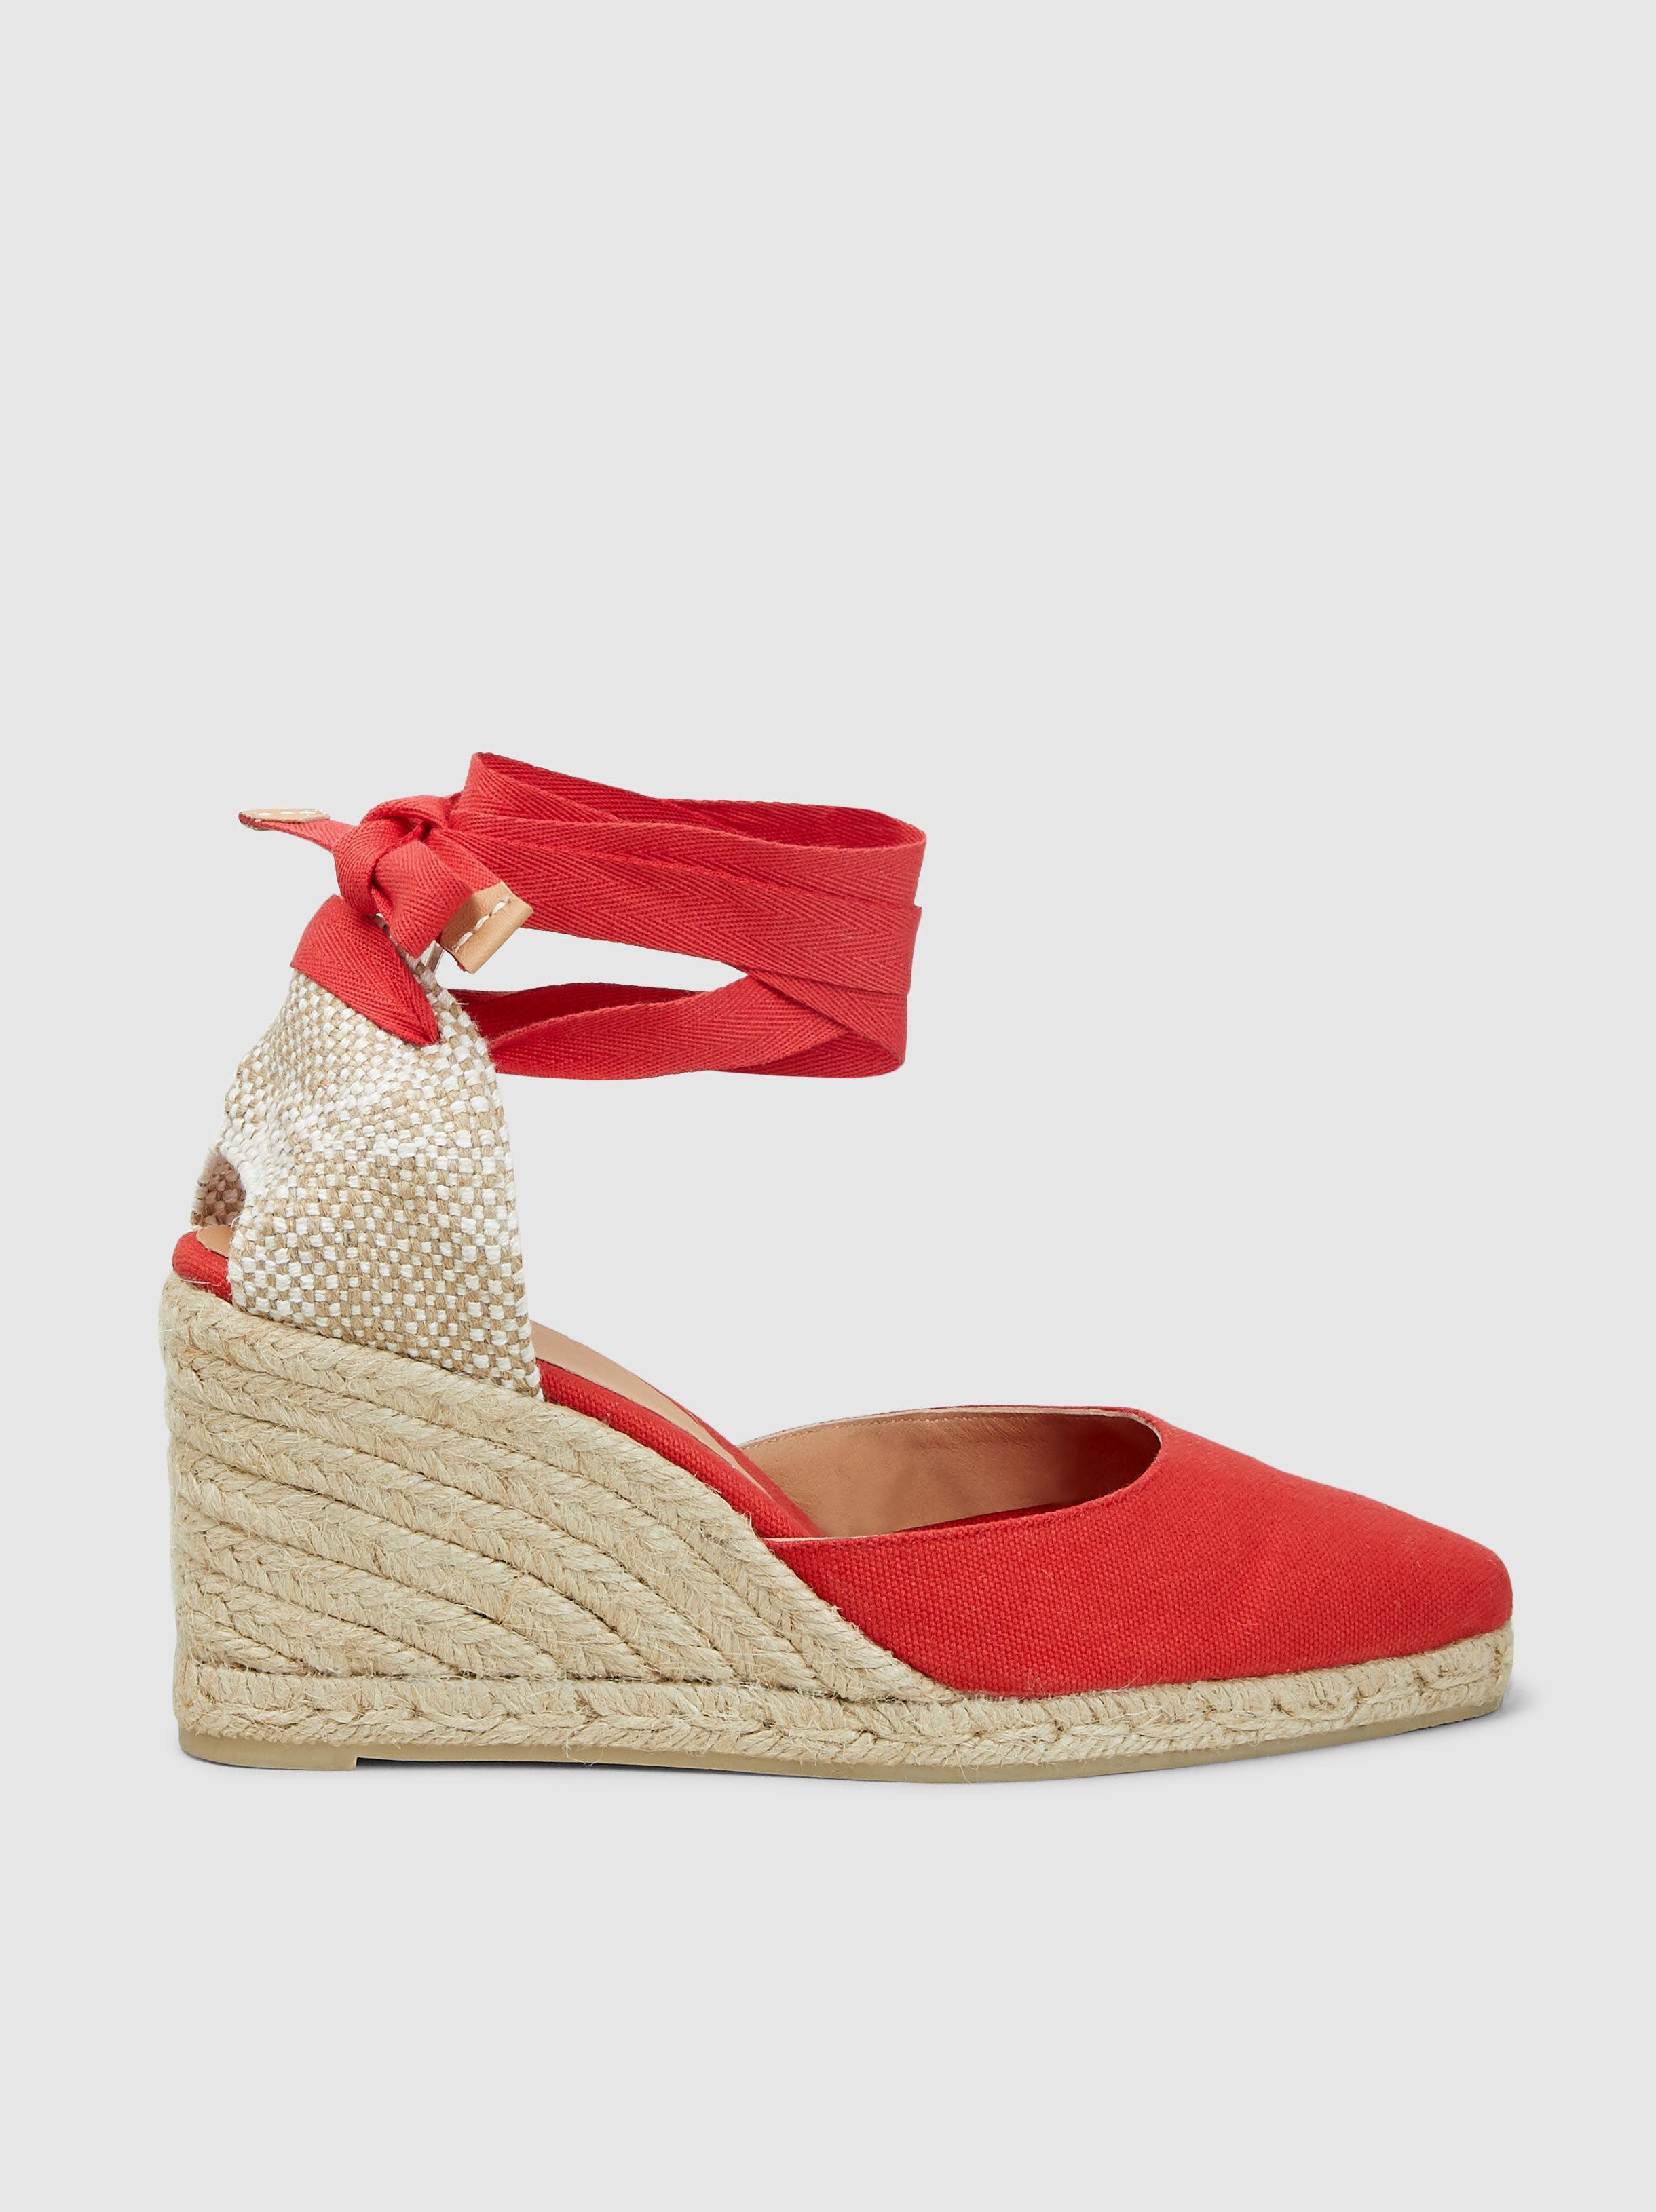 18aa00de1a Castaner Joyce Pointed Toe Wedge Heel Espadrilles in Red - Lyst